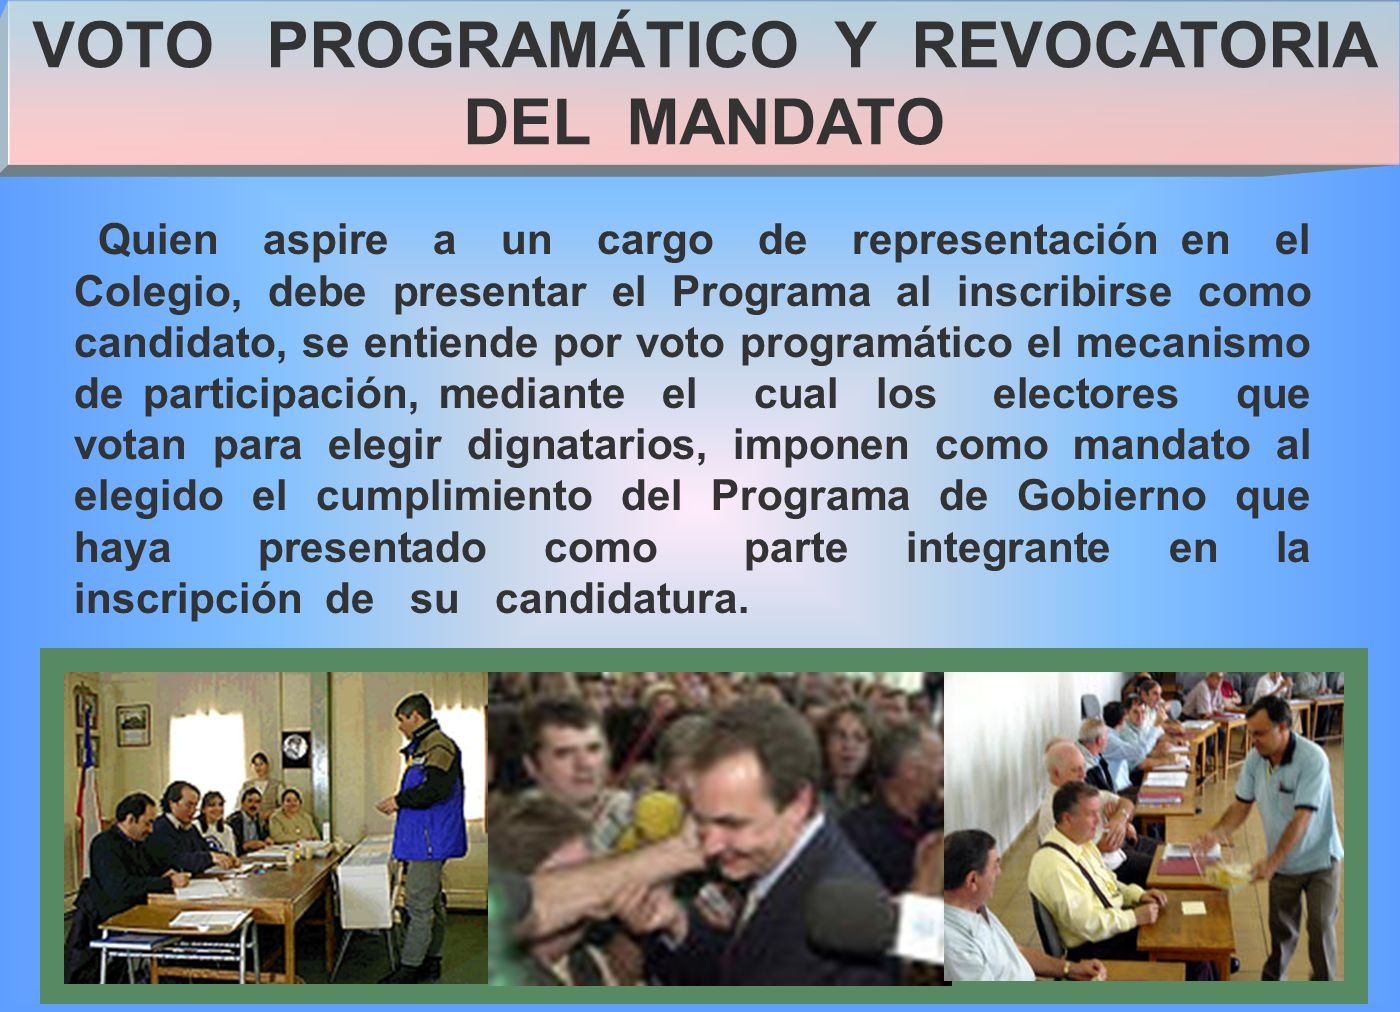 VOTO PROGRAMÁTICO Y REVOCATORIA DEL MANDATO